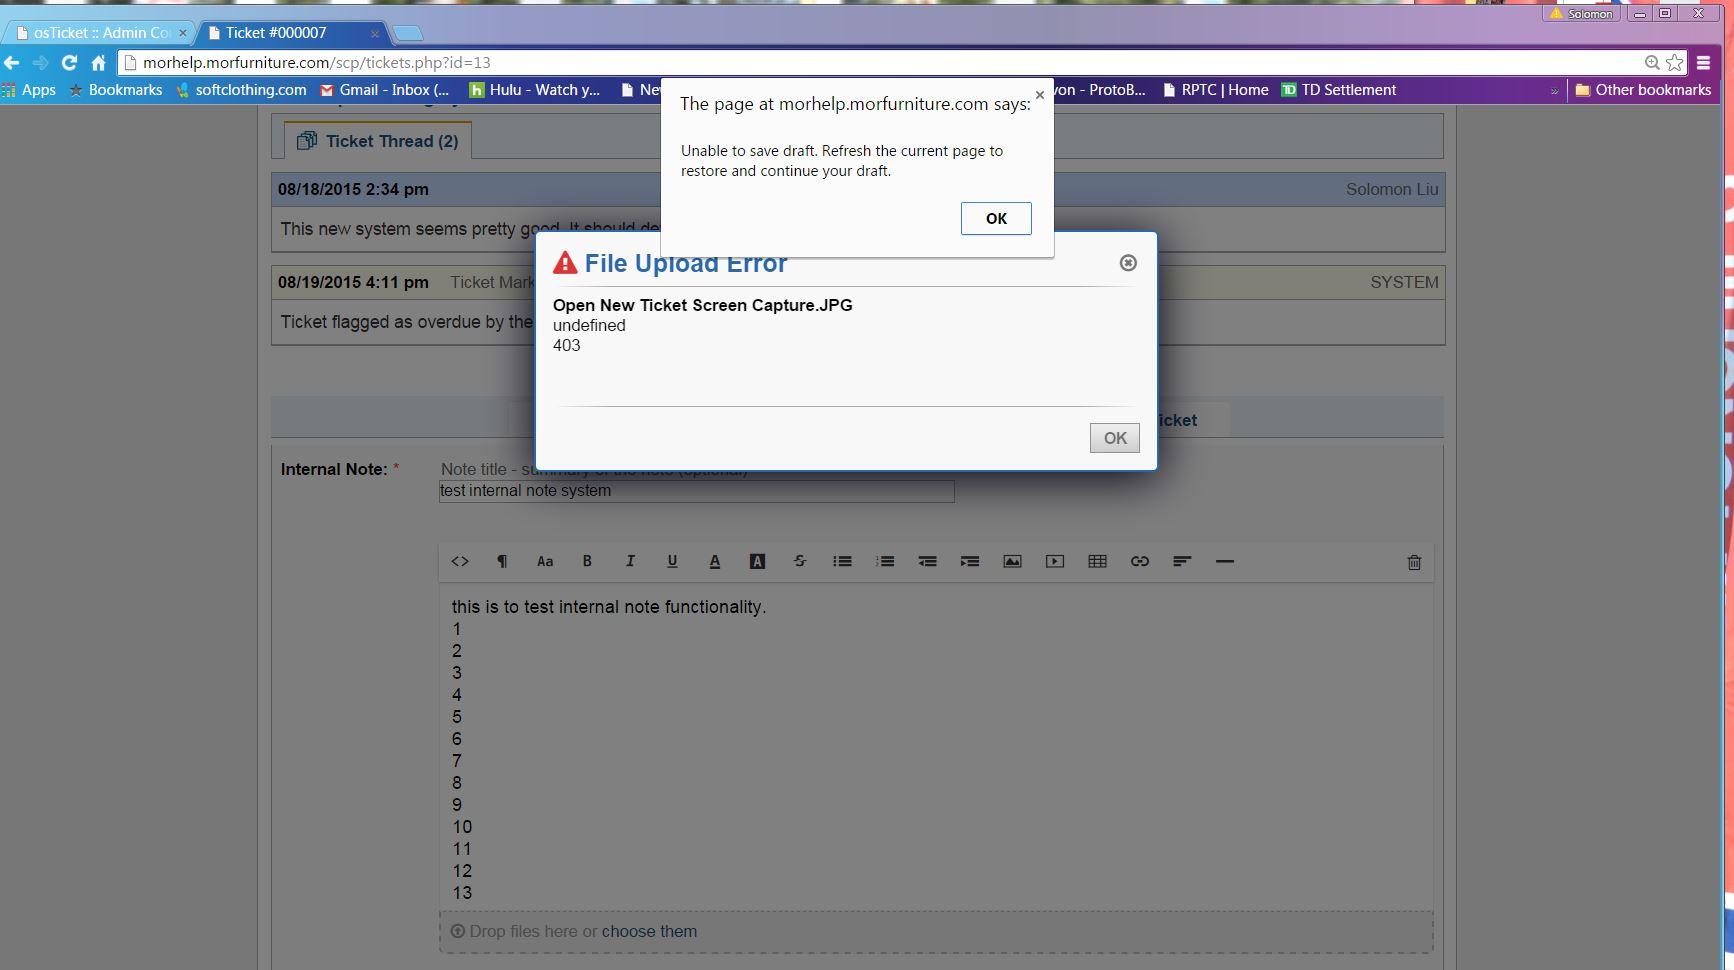 File Upload Error Screen Capture.JPG